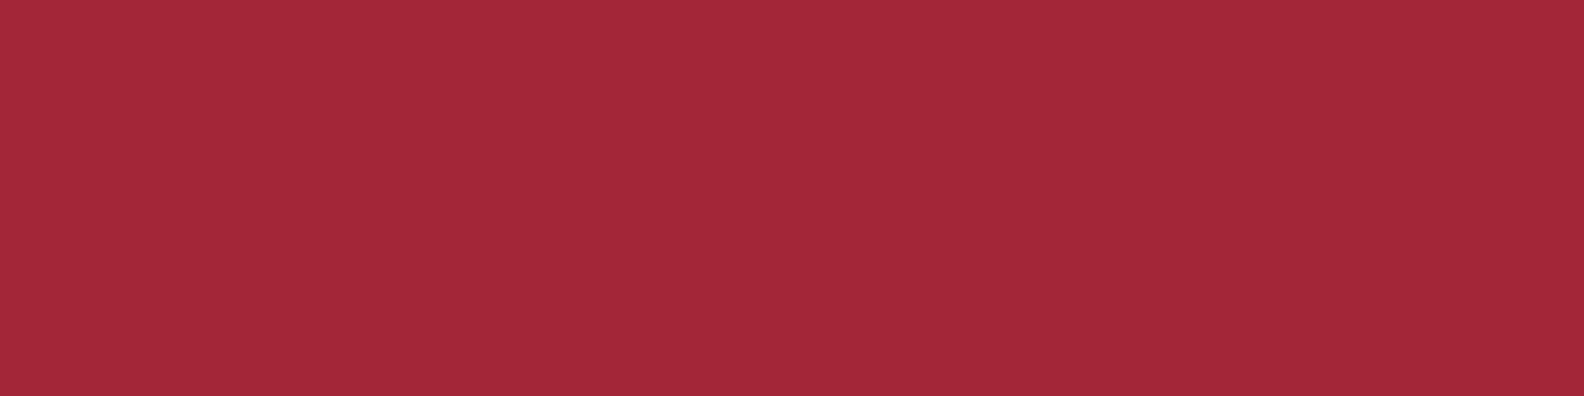 1584x396 Alabama Crimson Solid Color Background